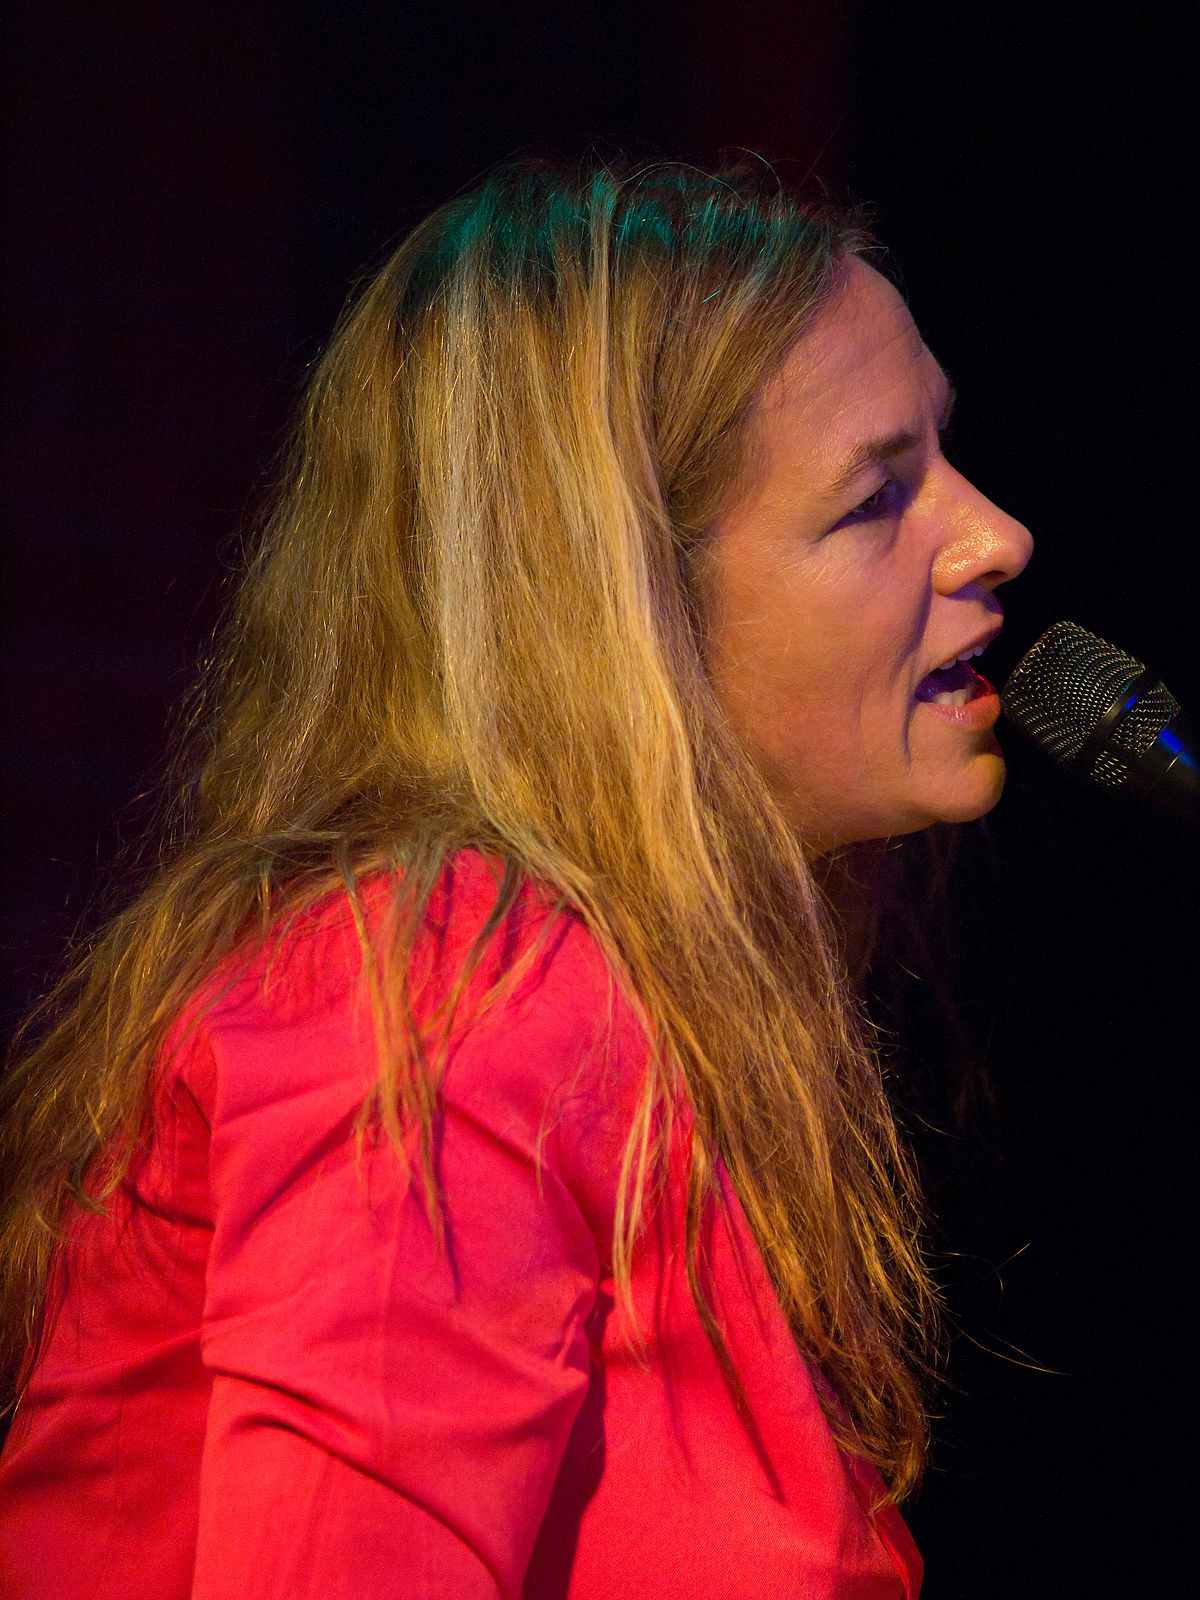 Susi Hyldgaard – Wikipedia